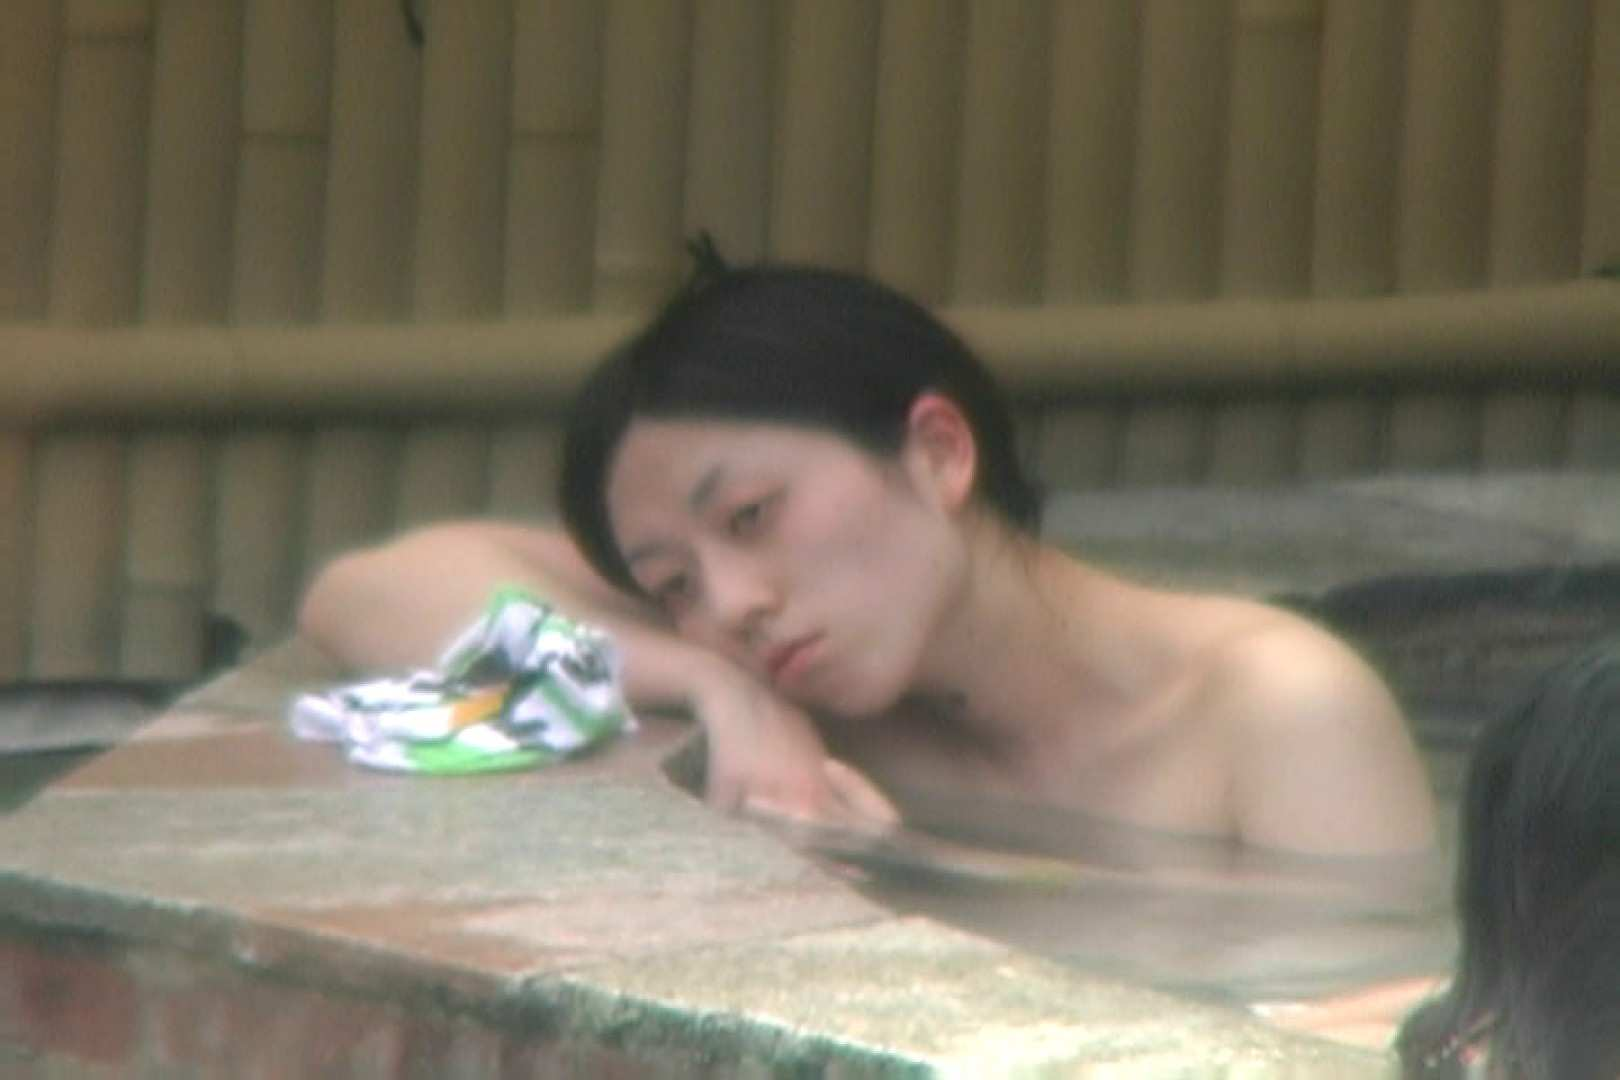 Aquaな露天風呂Vol.562 露天 AV無料動画キャプチャ 109画像 74